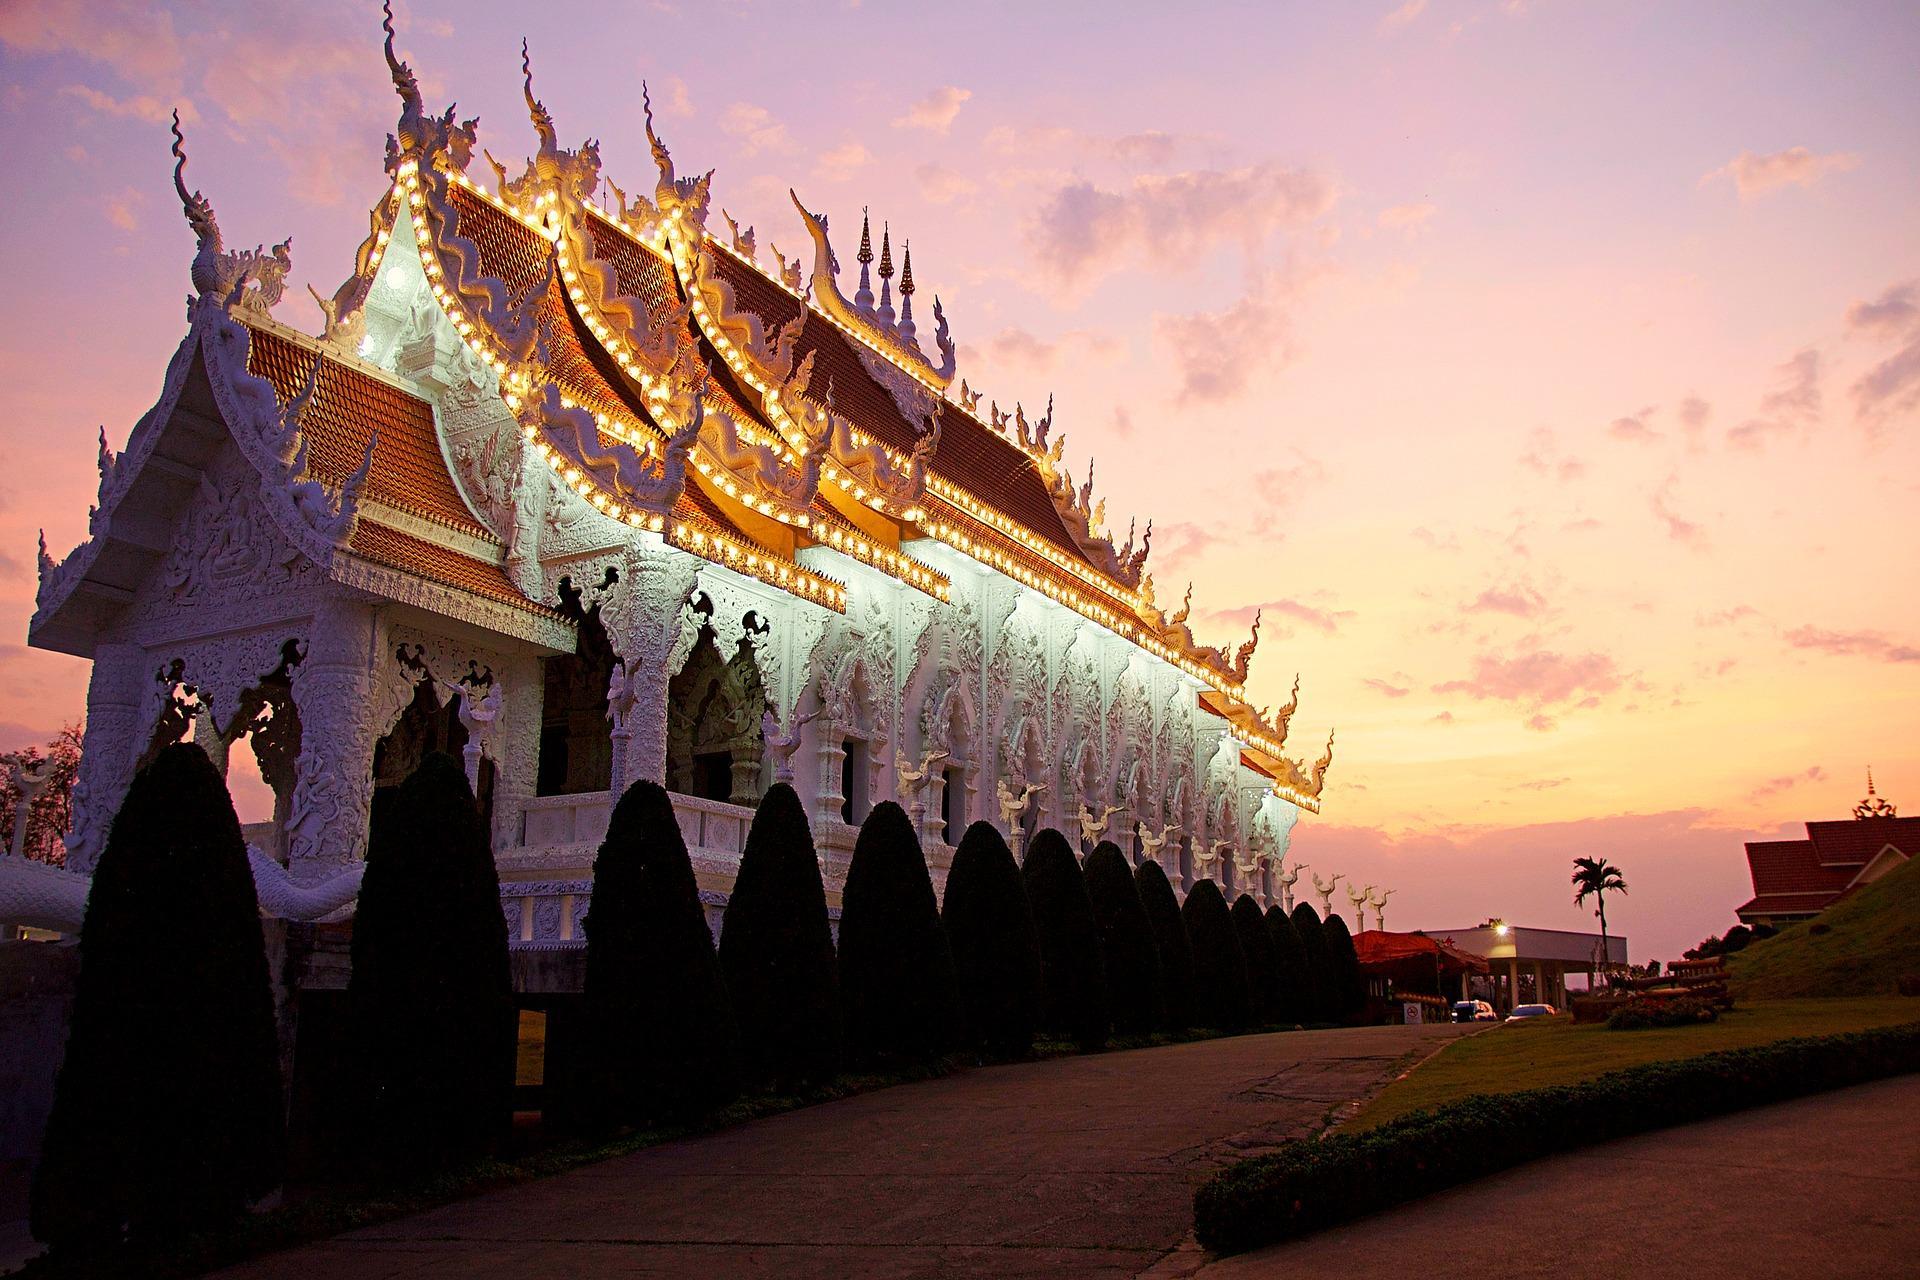 /optitravel/online/www/layout22/single_product.php?pkt_id=41&Produto=Bangkok, Maravilhas do Norte (Privado) & Phuket&destino=TAILÂNDIA